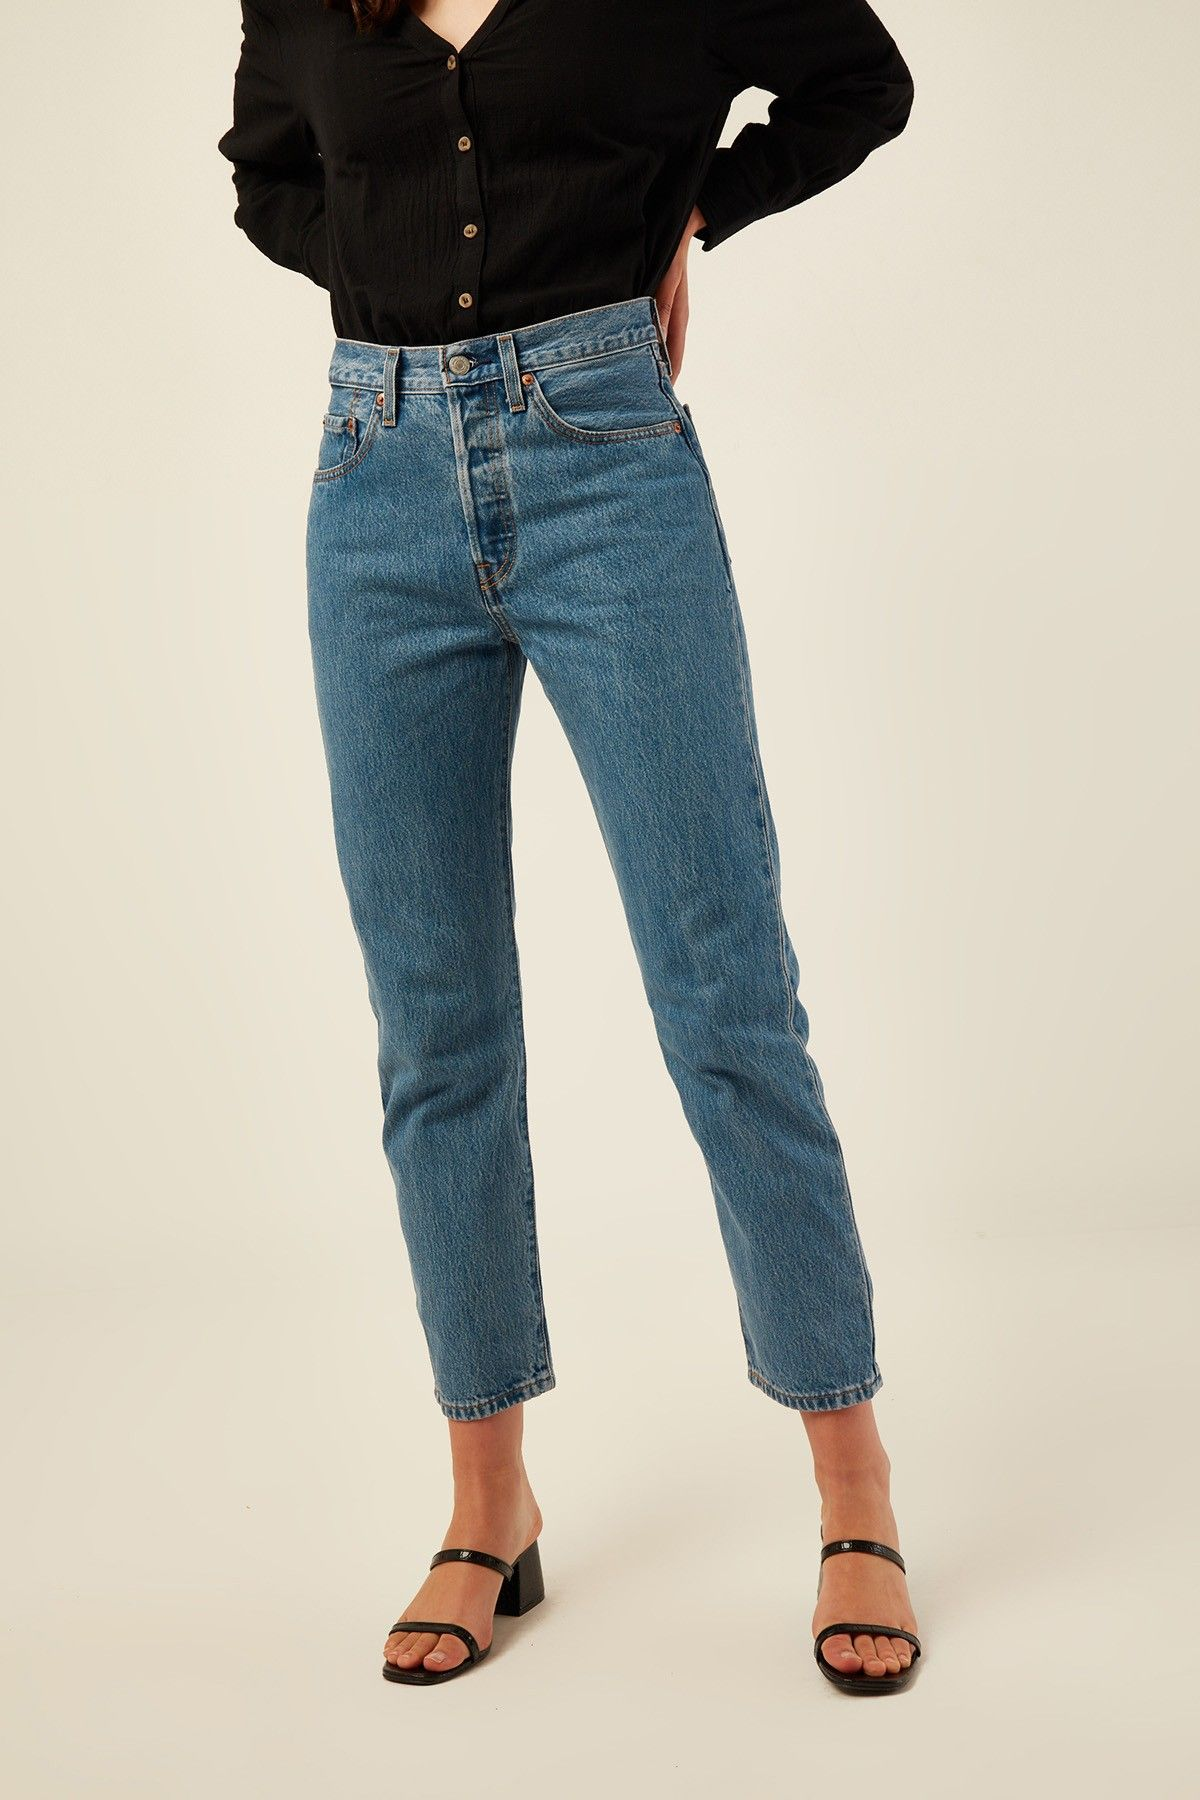 60da8170834 LEVIS 501 Crop Lost Cause | Fashion inspiration in 2019 | Jeans ...